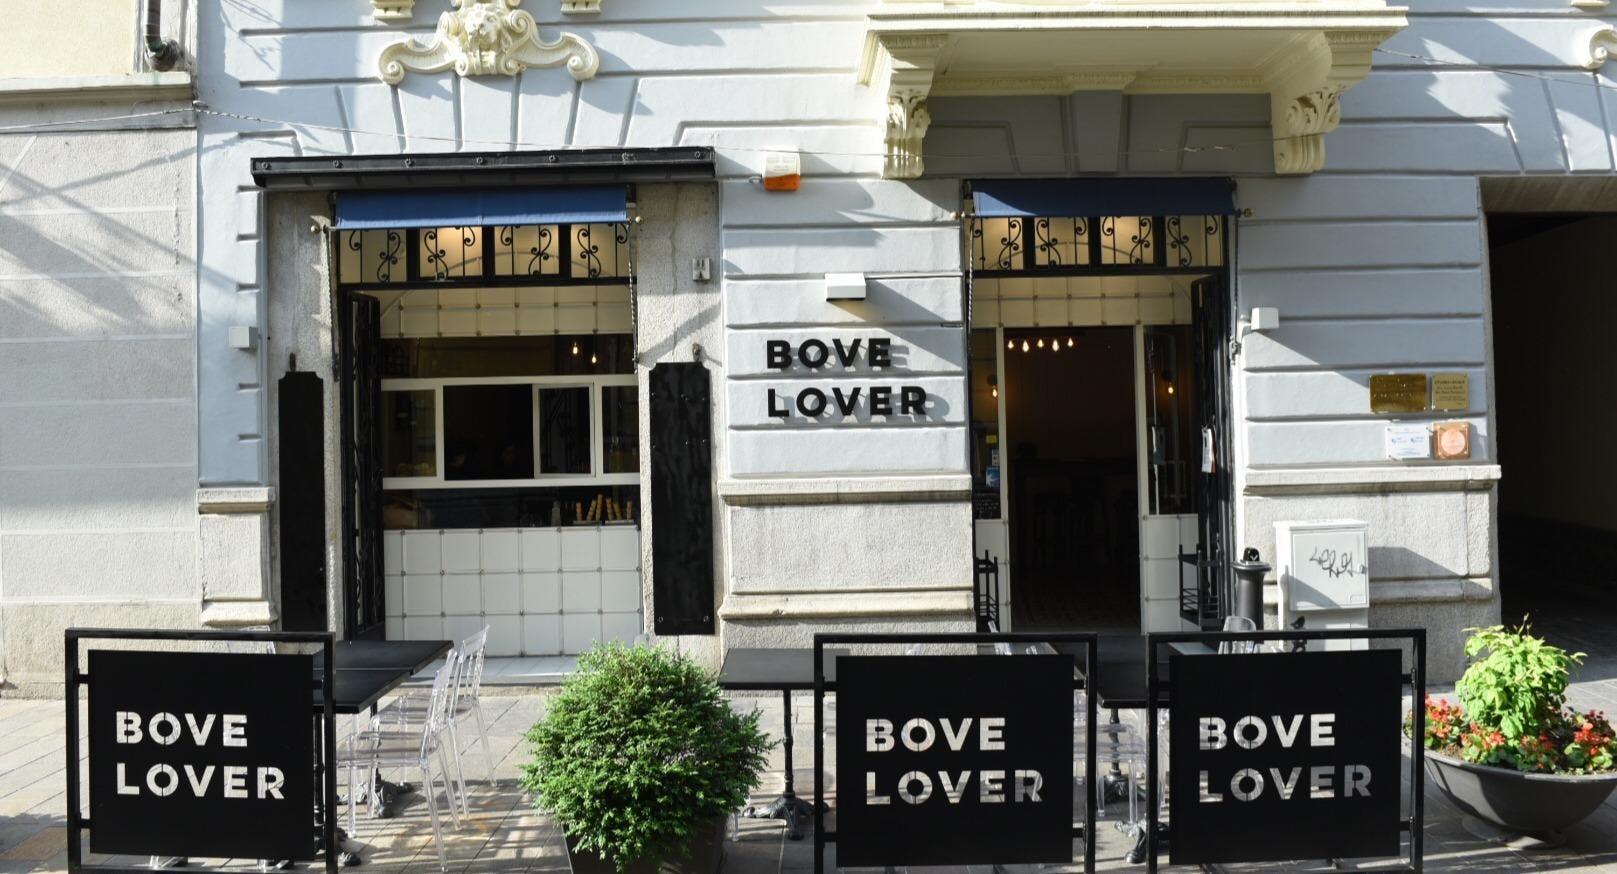 Bove Lover